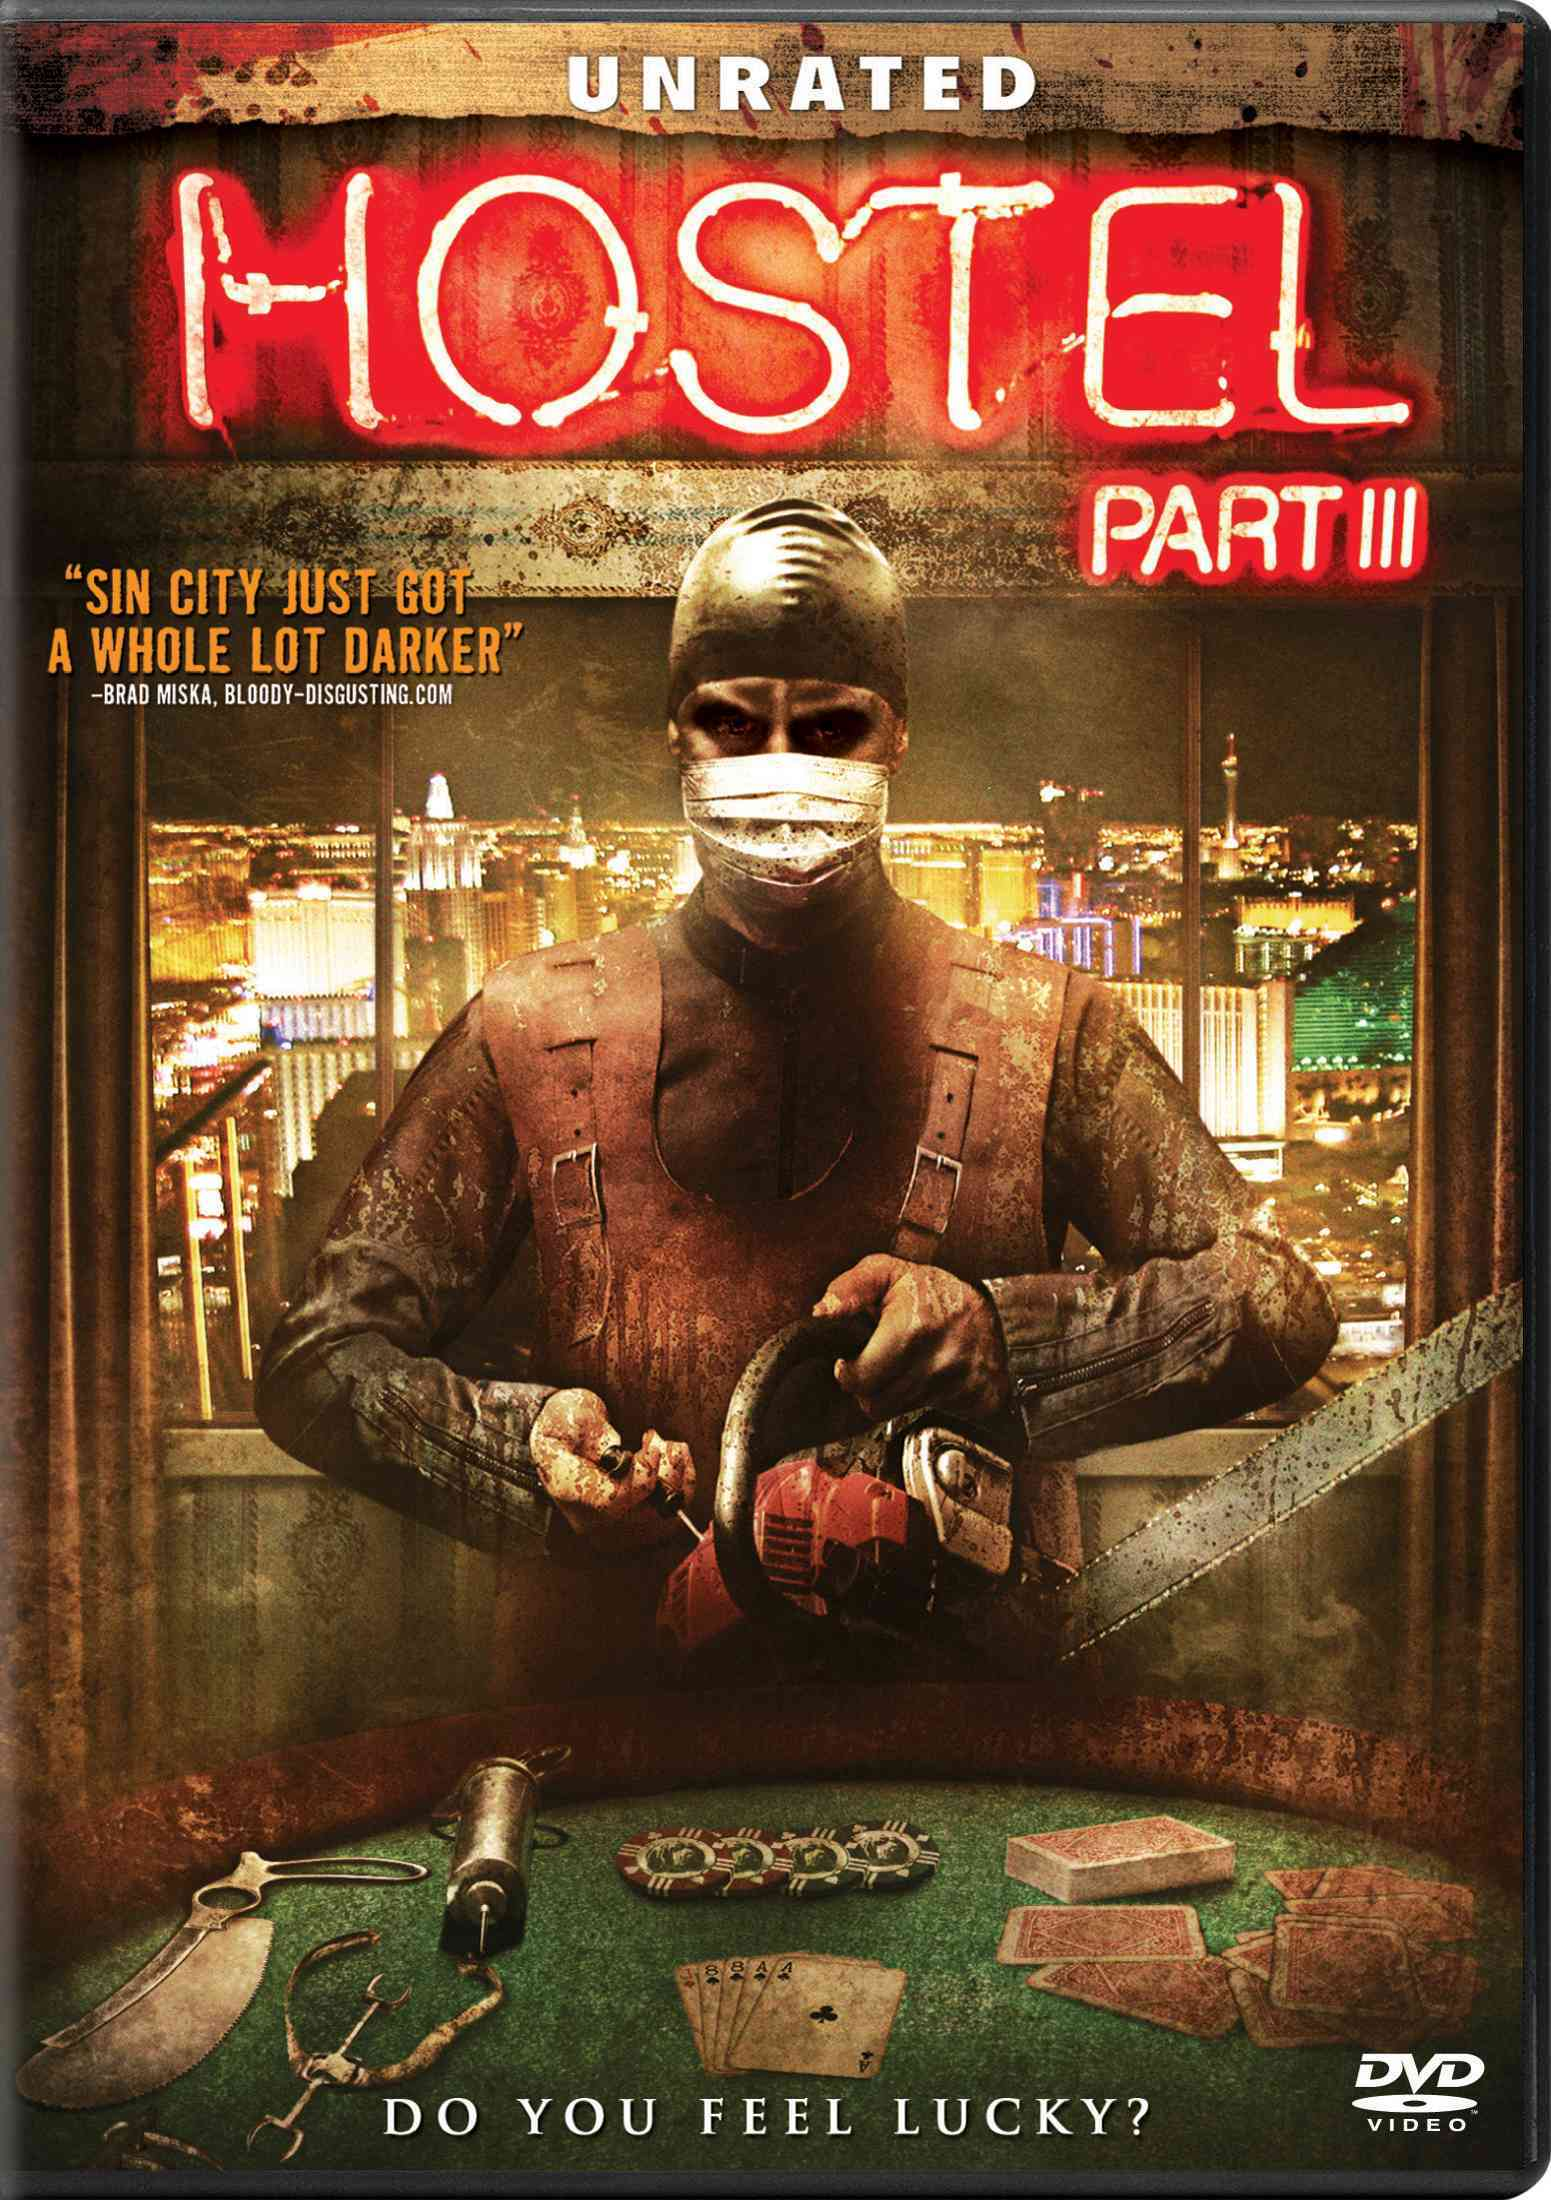 HOSTEL PART III BY KRETSCHMANN,THOMAS (DVD)